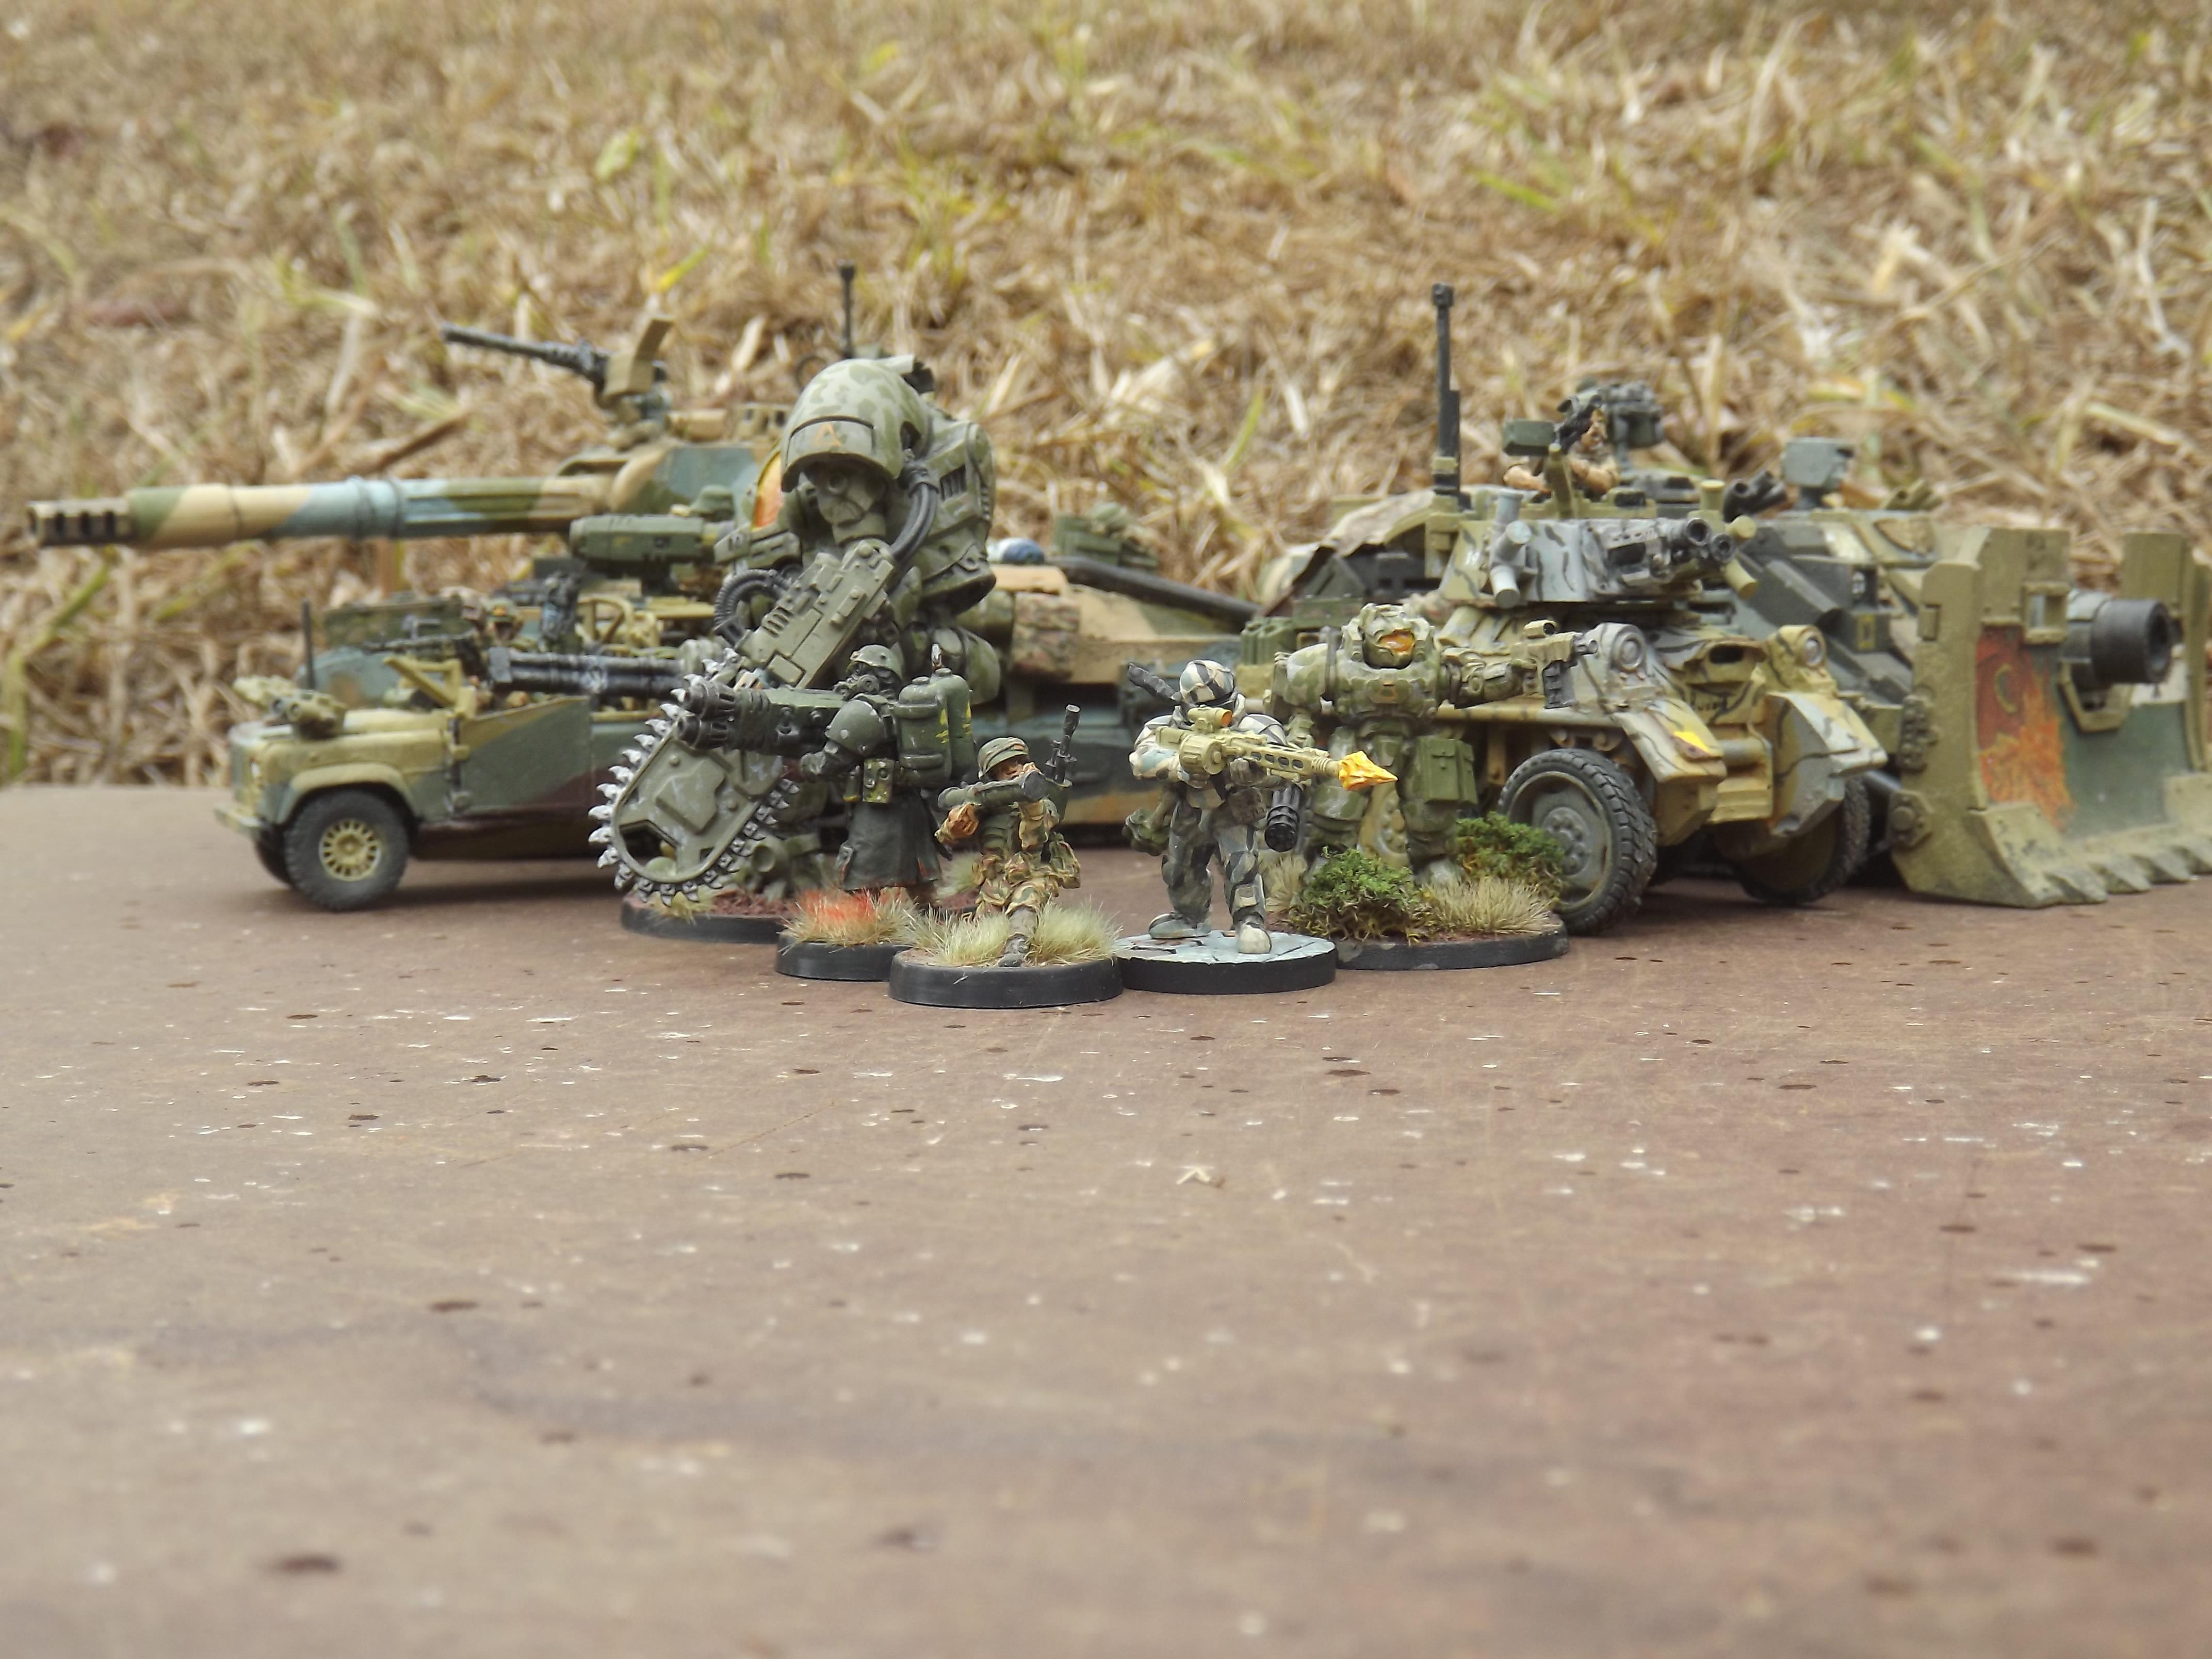 Ajax, Anvil Industry, Armoured Car, Chimera, Commando, Conversion, Grenadier, Landrover, Mantic Games, Mech, Ramshackle Games, Rifleman, Tamiya, Tank, Turret, Victoria Miniatures, Vindicator, Wmik